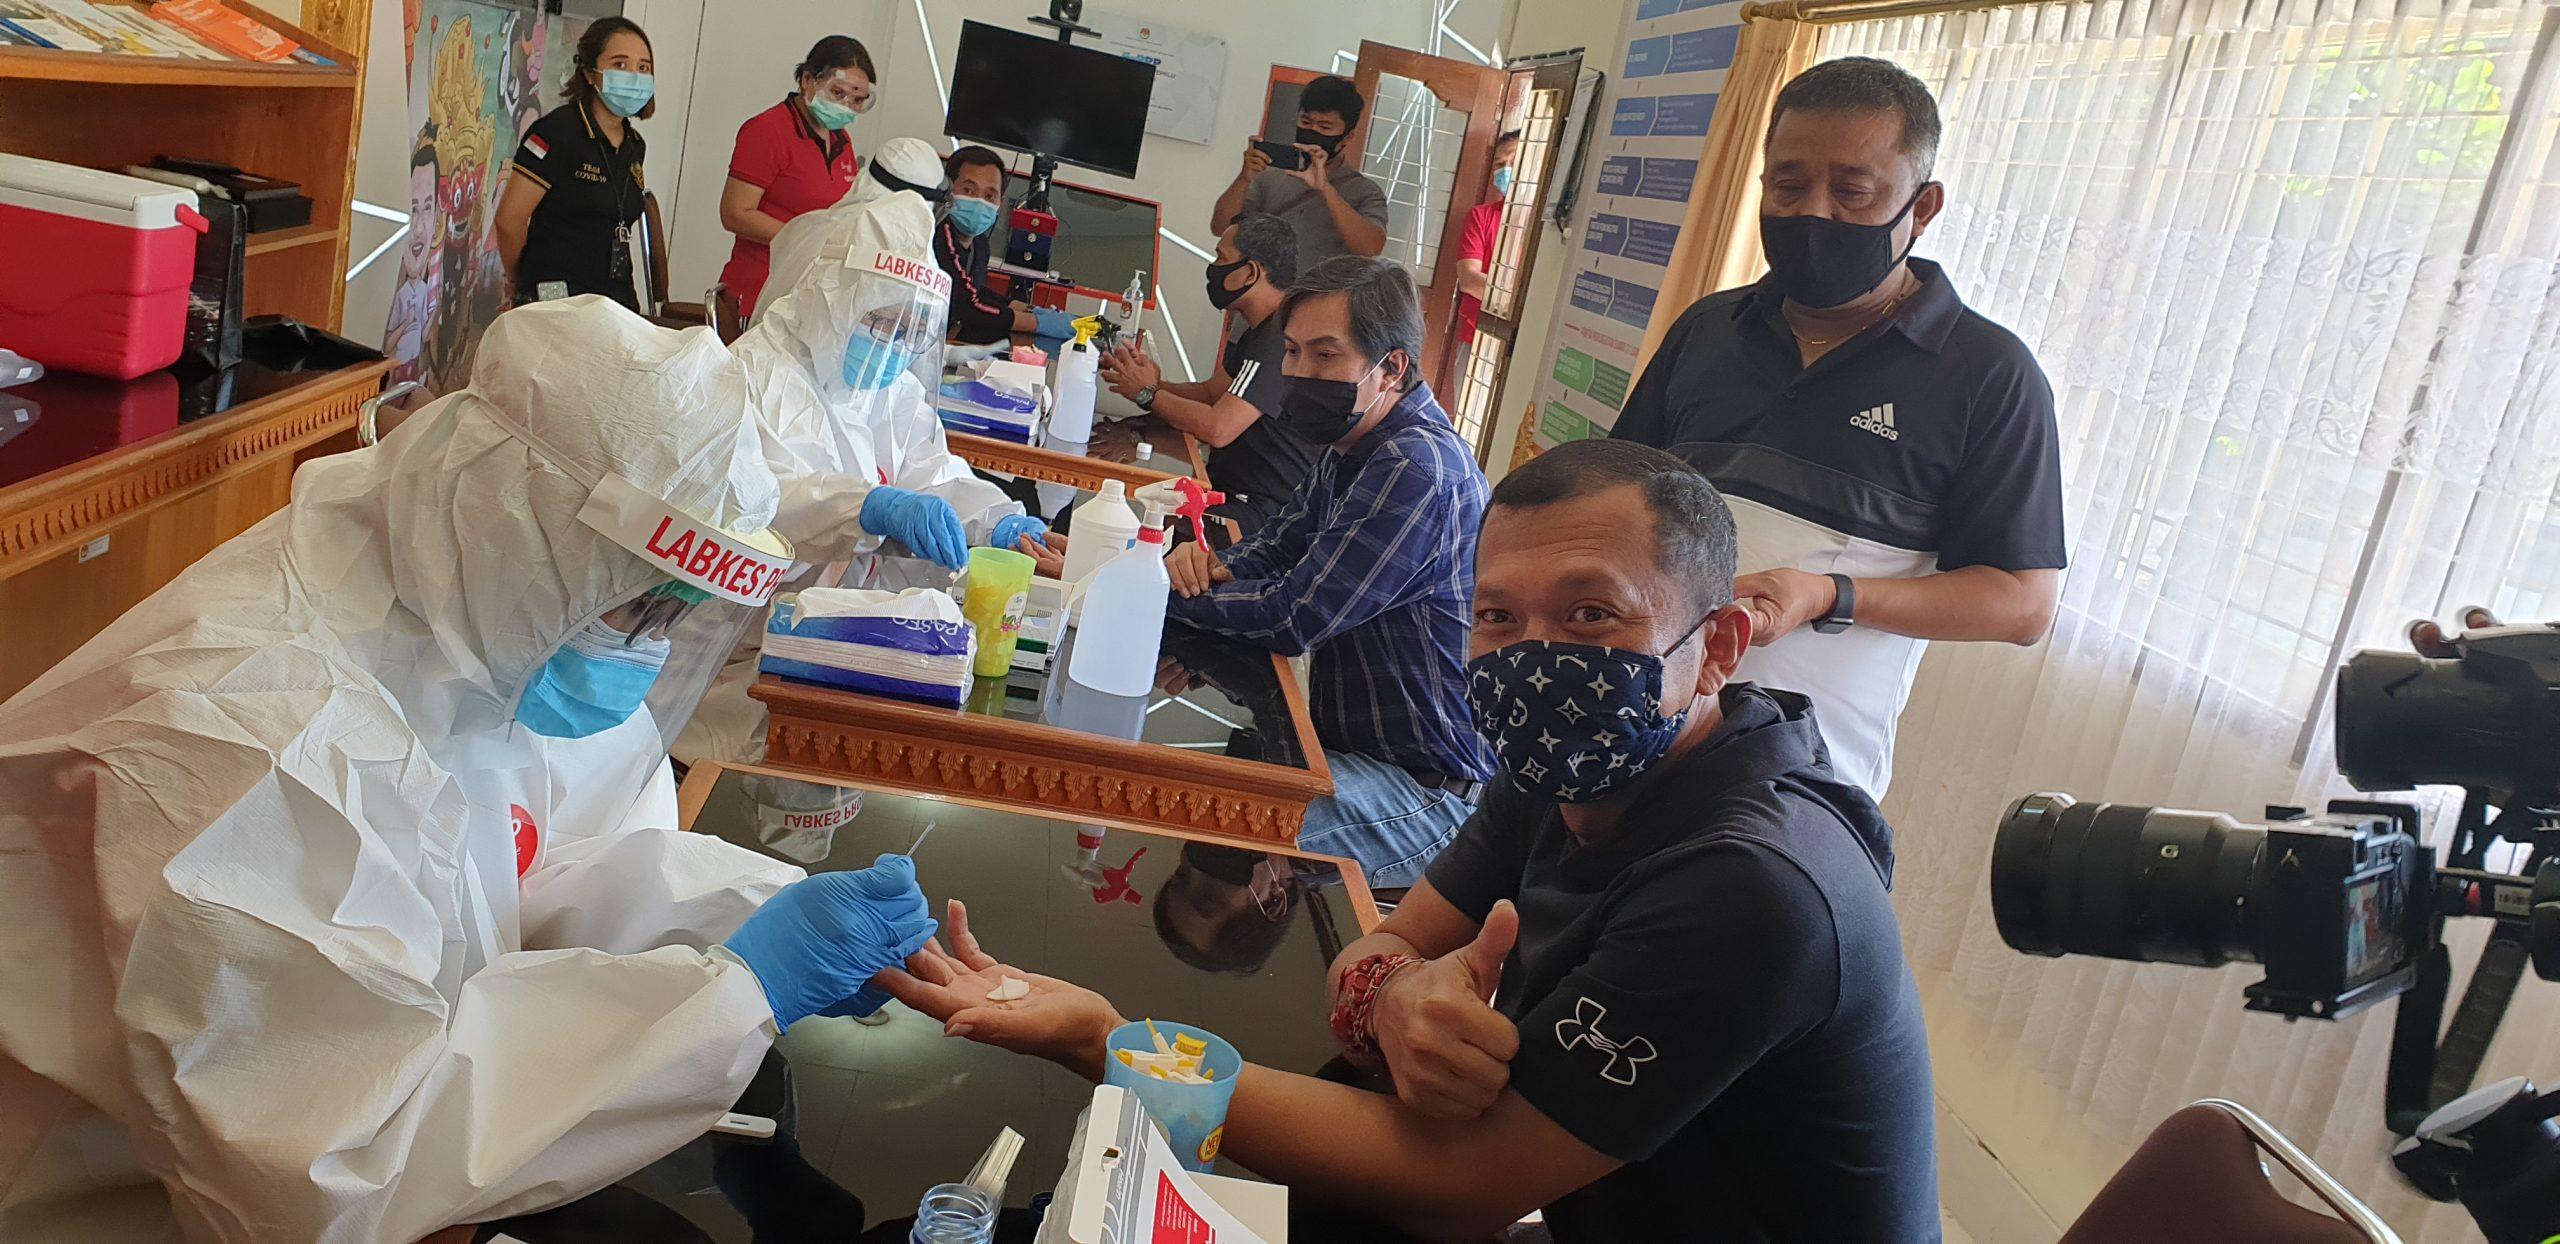 ANGGOTA KPU Bali, I Gede John Darmawan, saat diambil sampel darah untuk tes cepat sebagai skrining awal virus Corona, Jumat (12/6/2020). Tes cepat dilakukan serentak di juga di enam KPU kabupaten/kota yang akan melaksanakan Pilkada 2020, dan semua komisioner dinyatakan nonreaktif. Foto: gus hendra